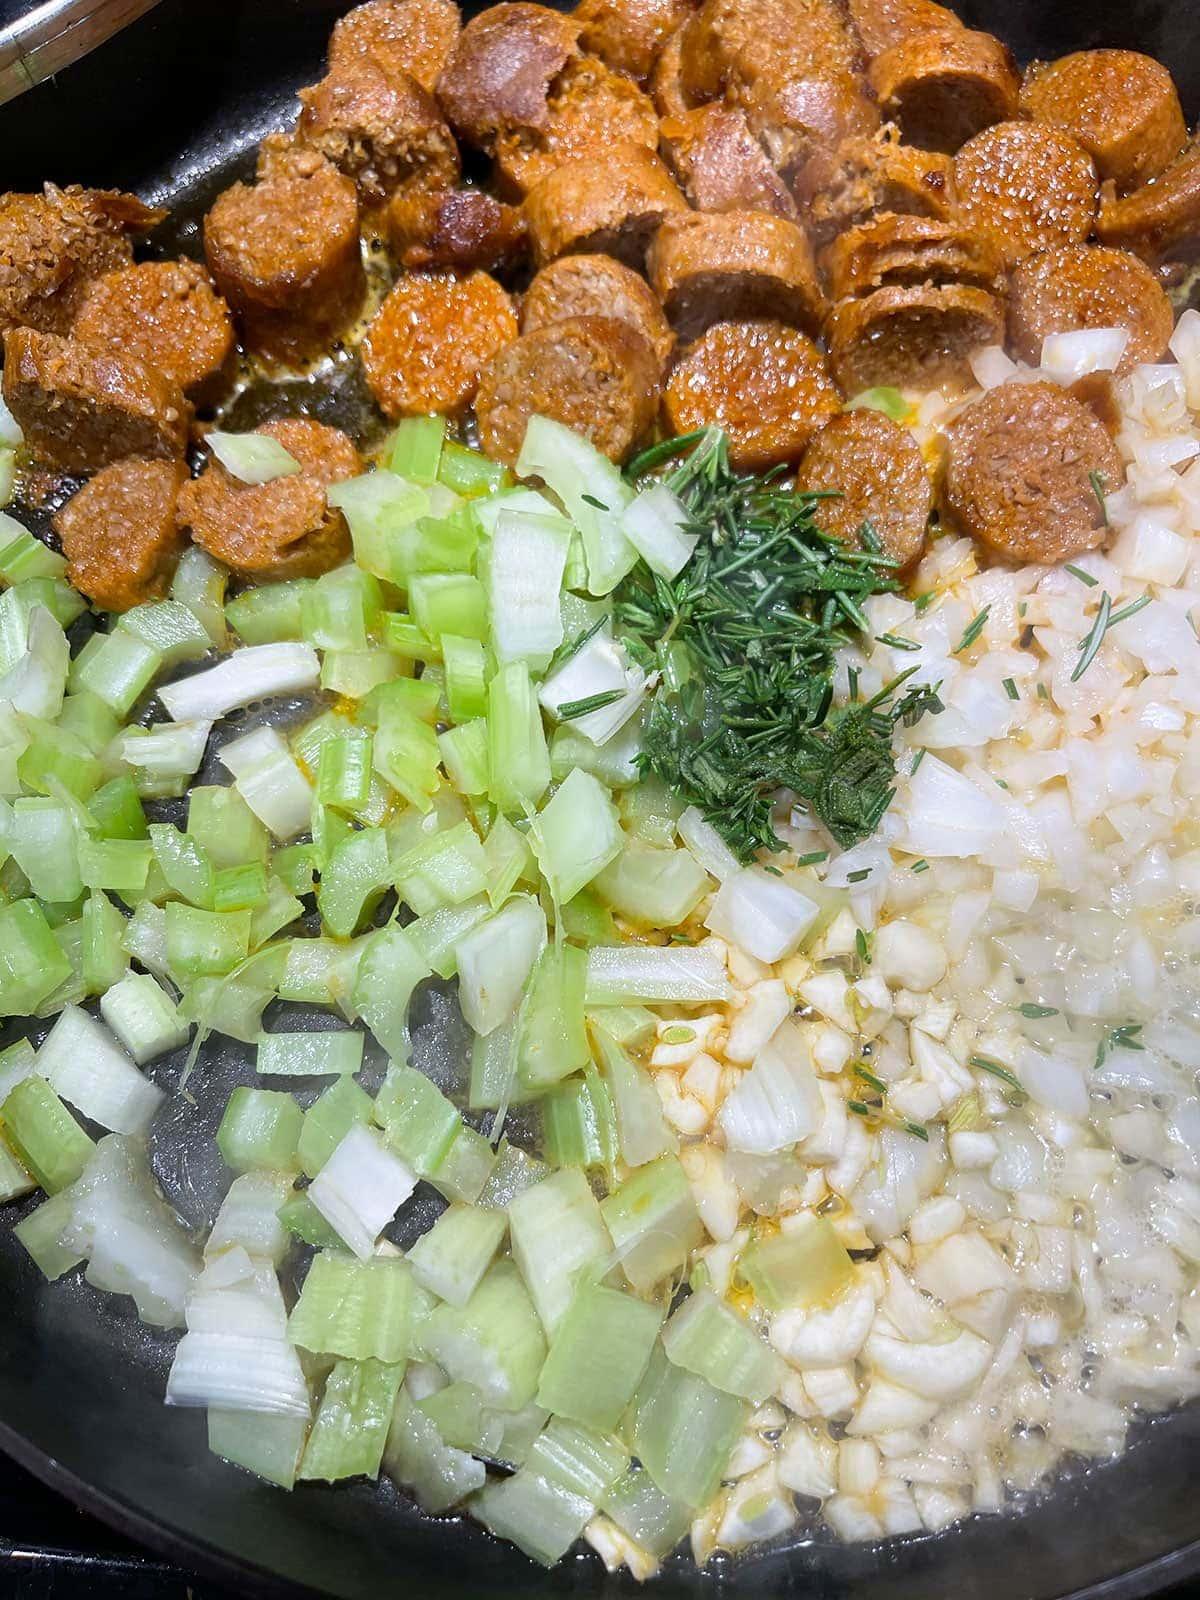 saute veggies in skillet